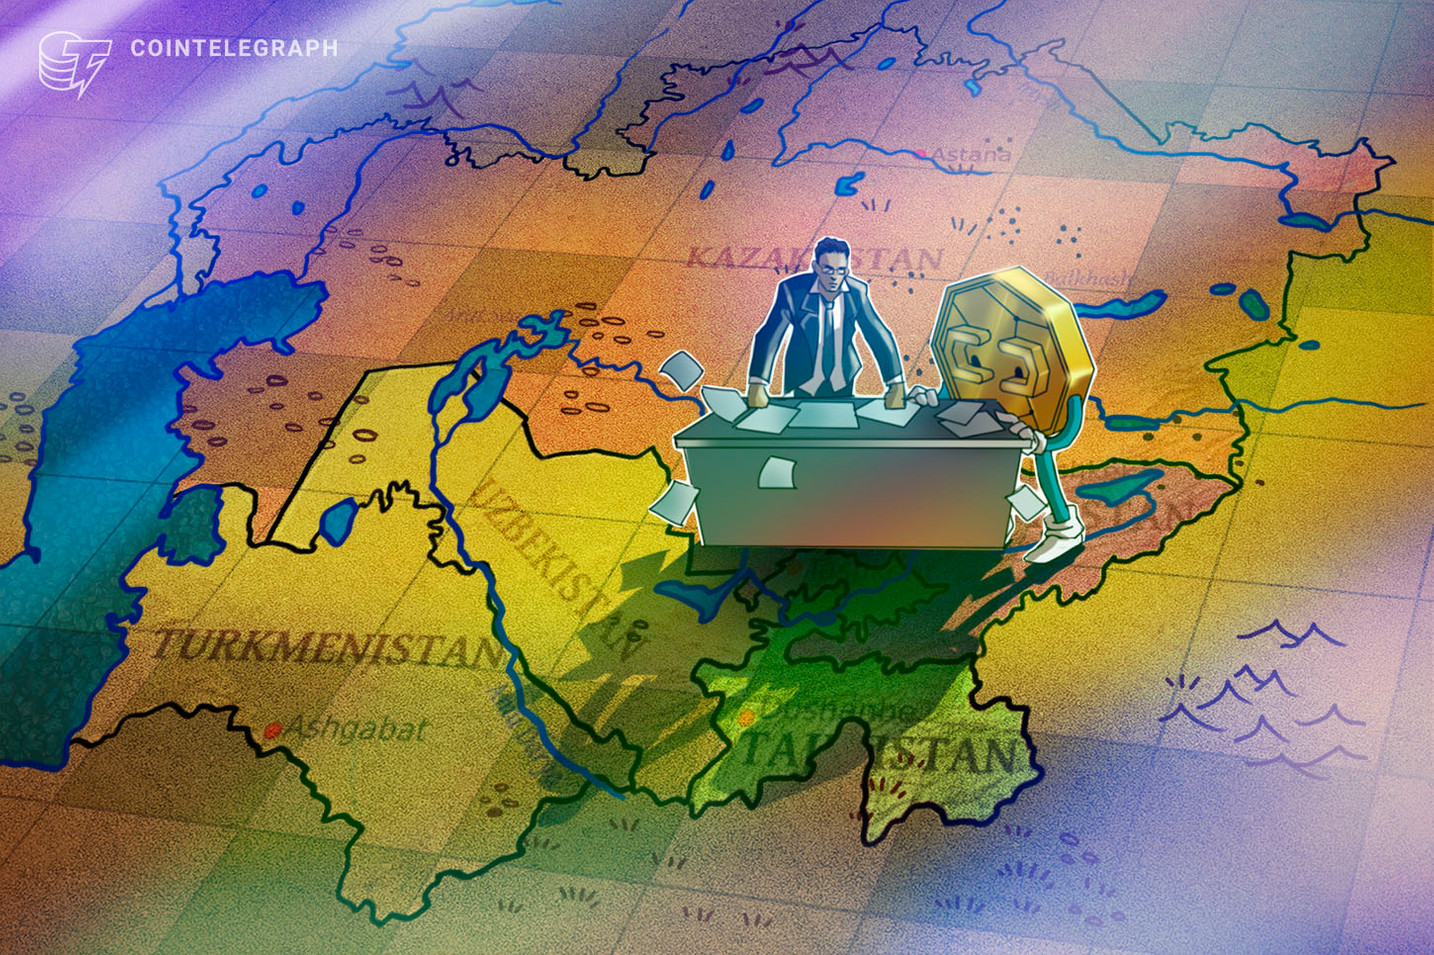 El banco central de Kirguistán planea introducir licencias para exchanges de criptomonedas